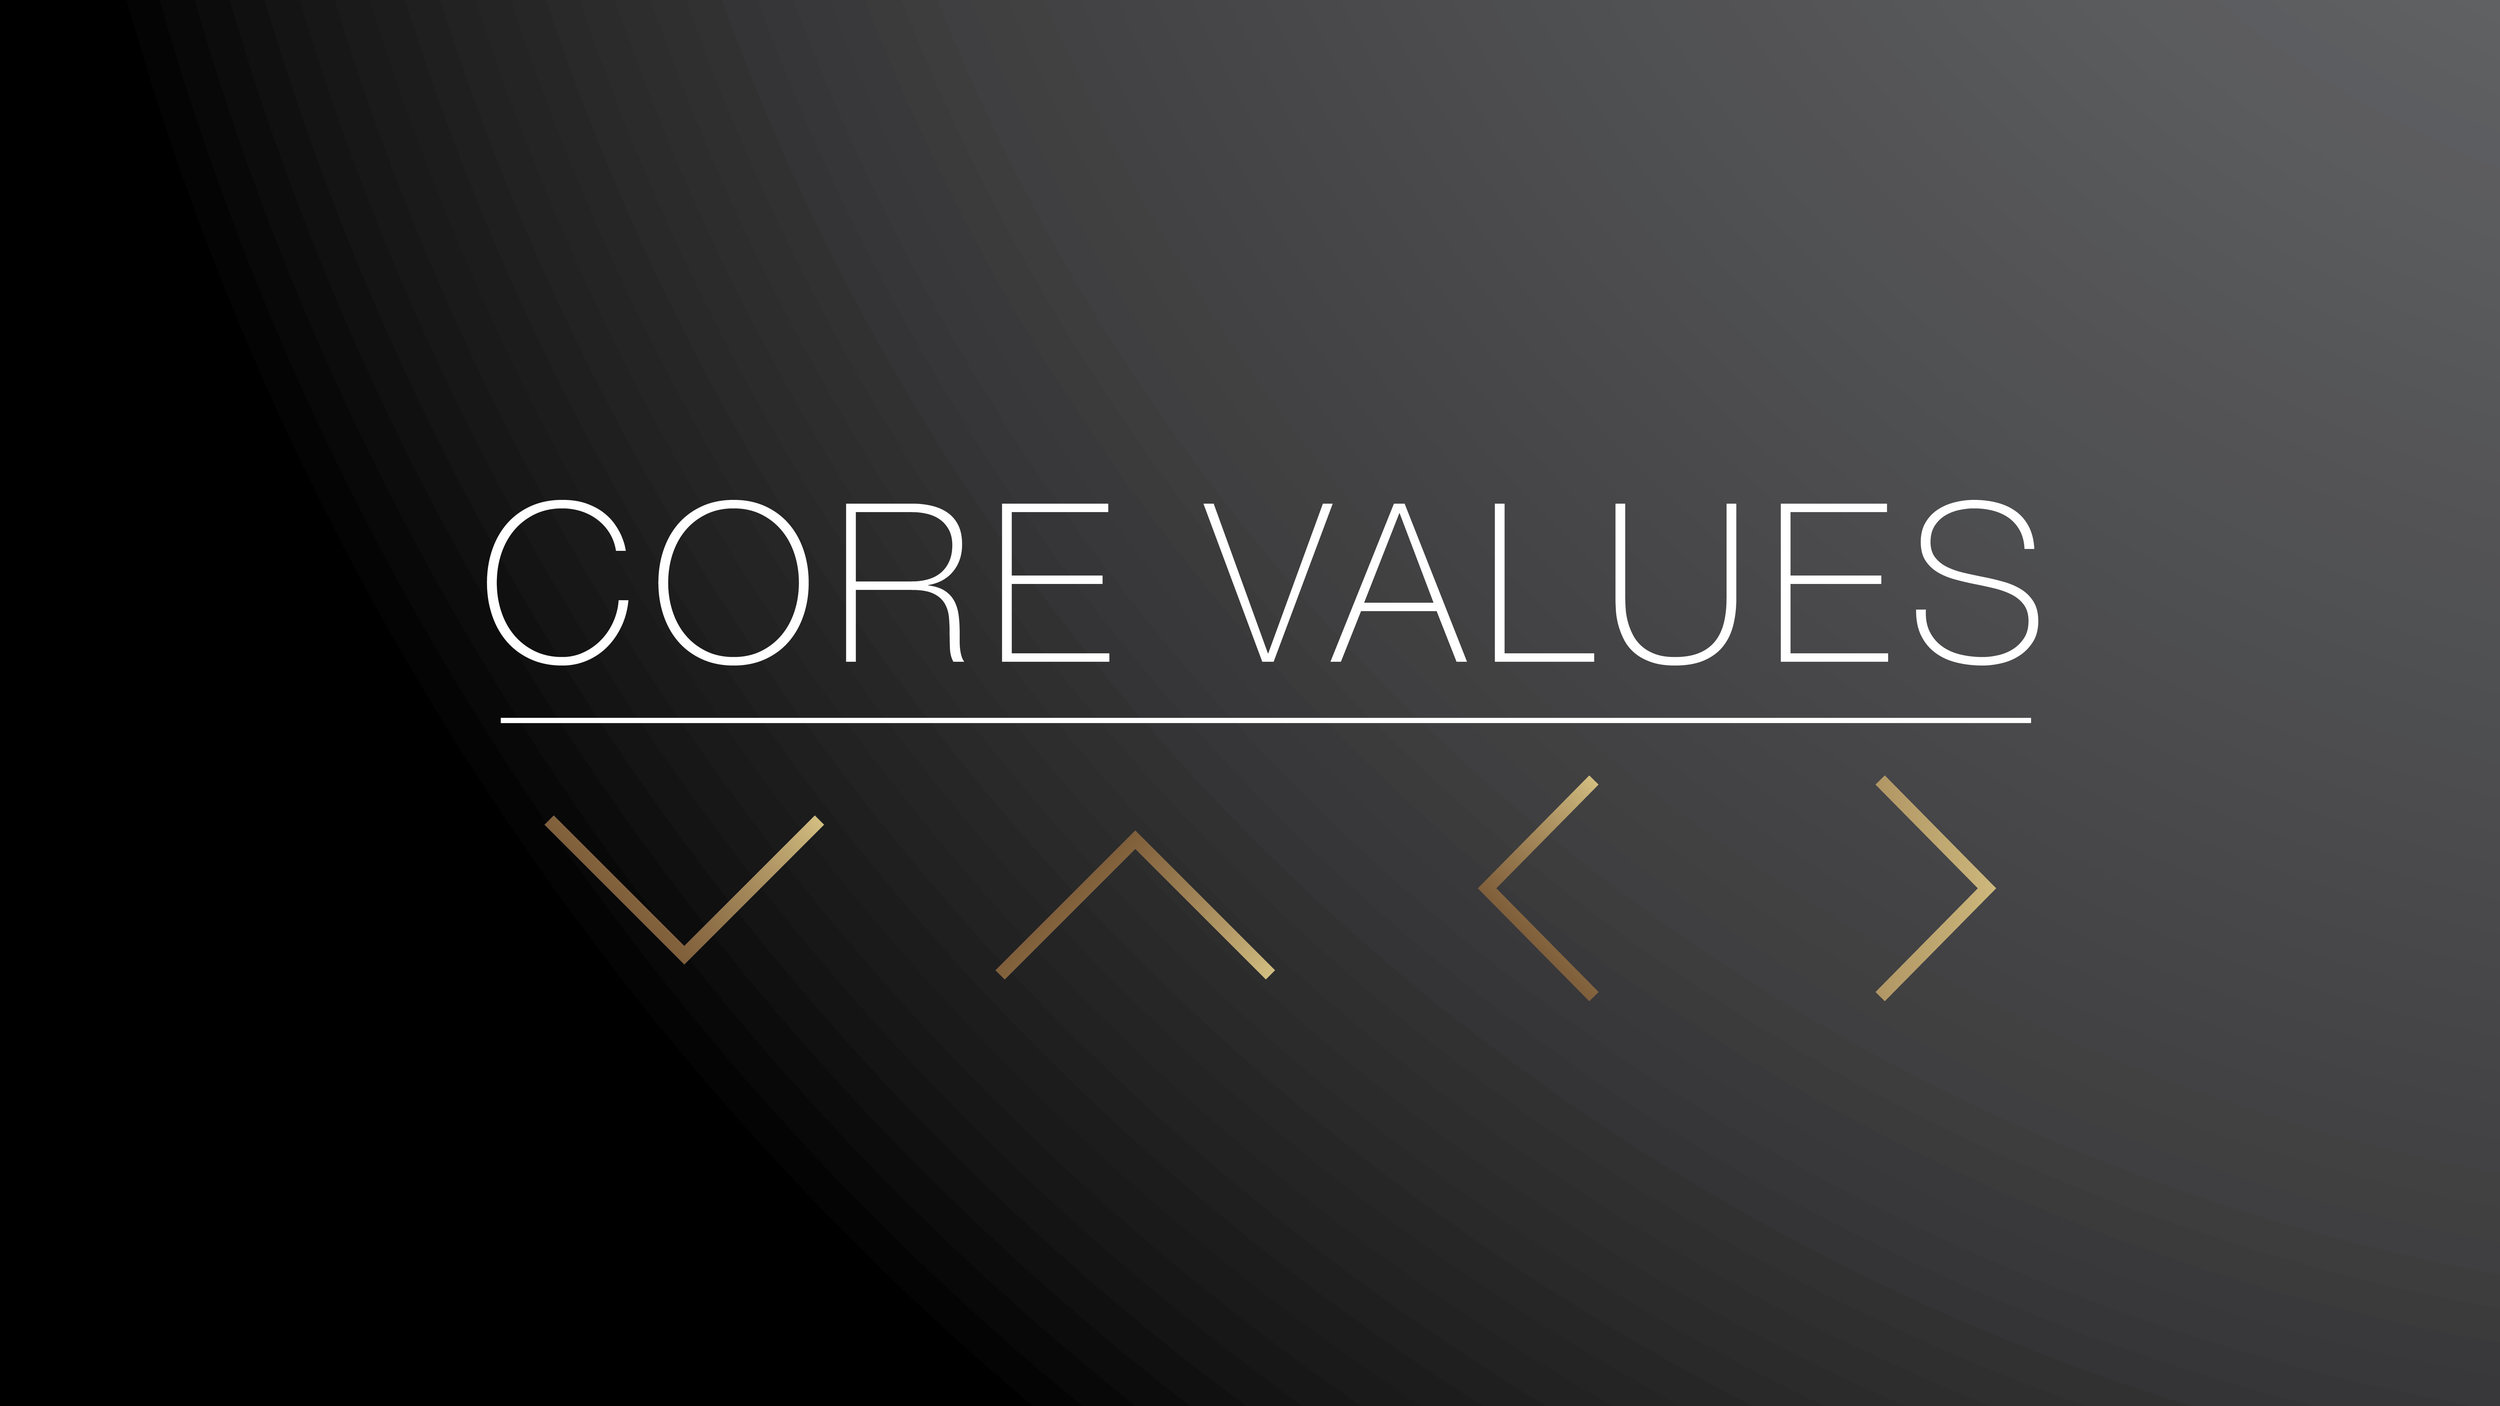 Core Values 2018 - Gospel, Worship, Community, Mission